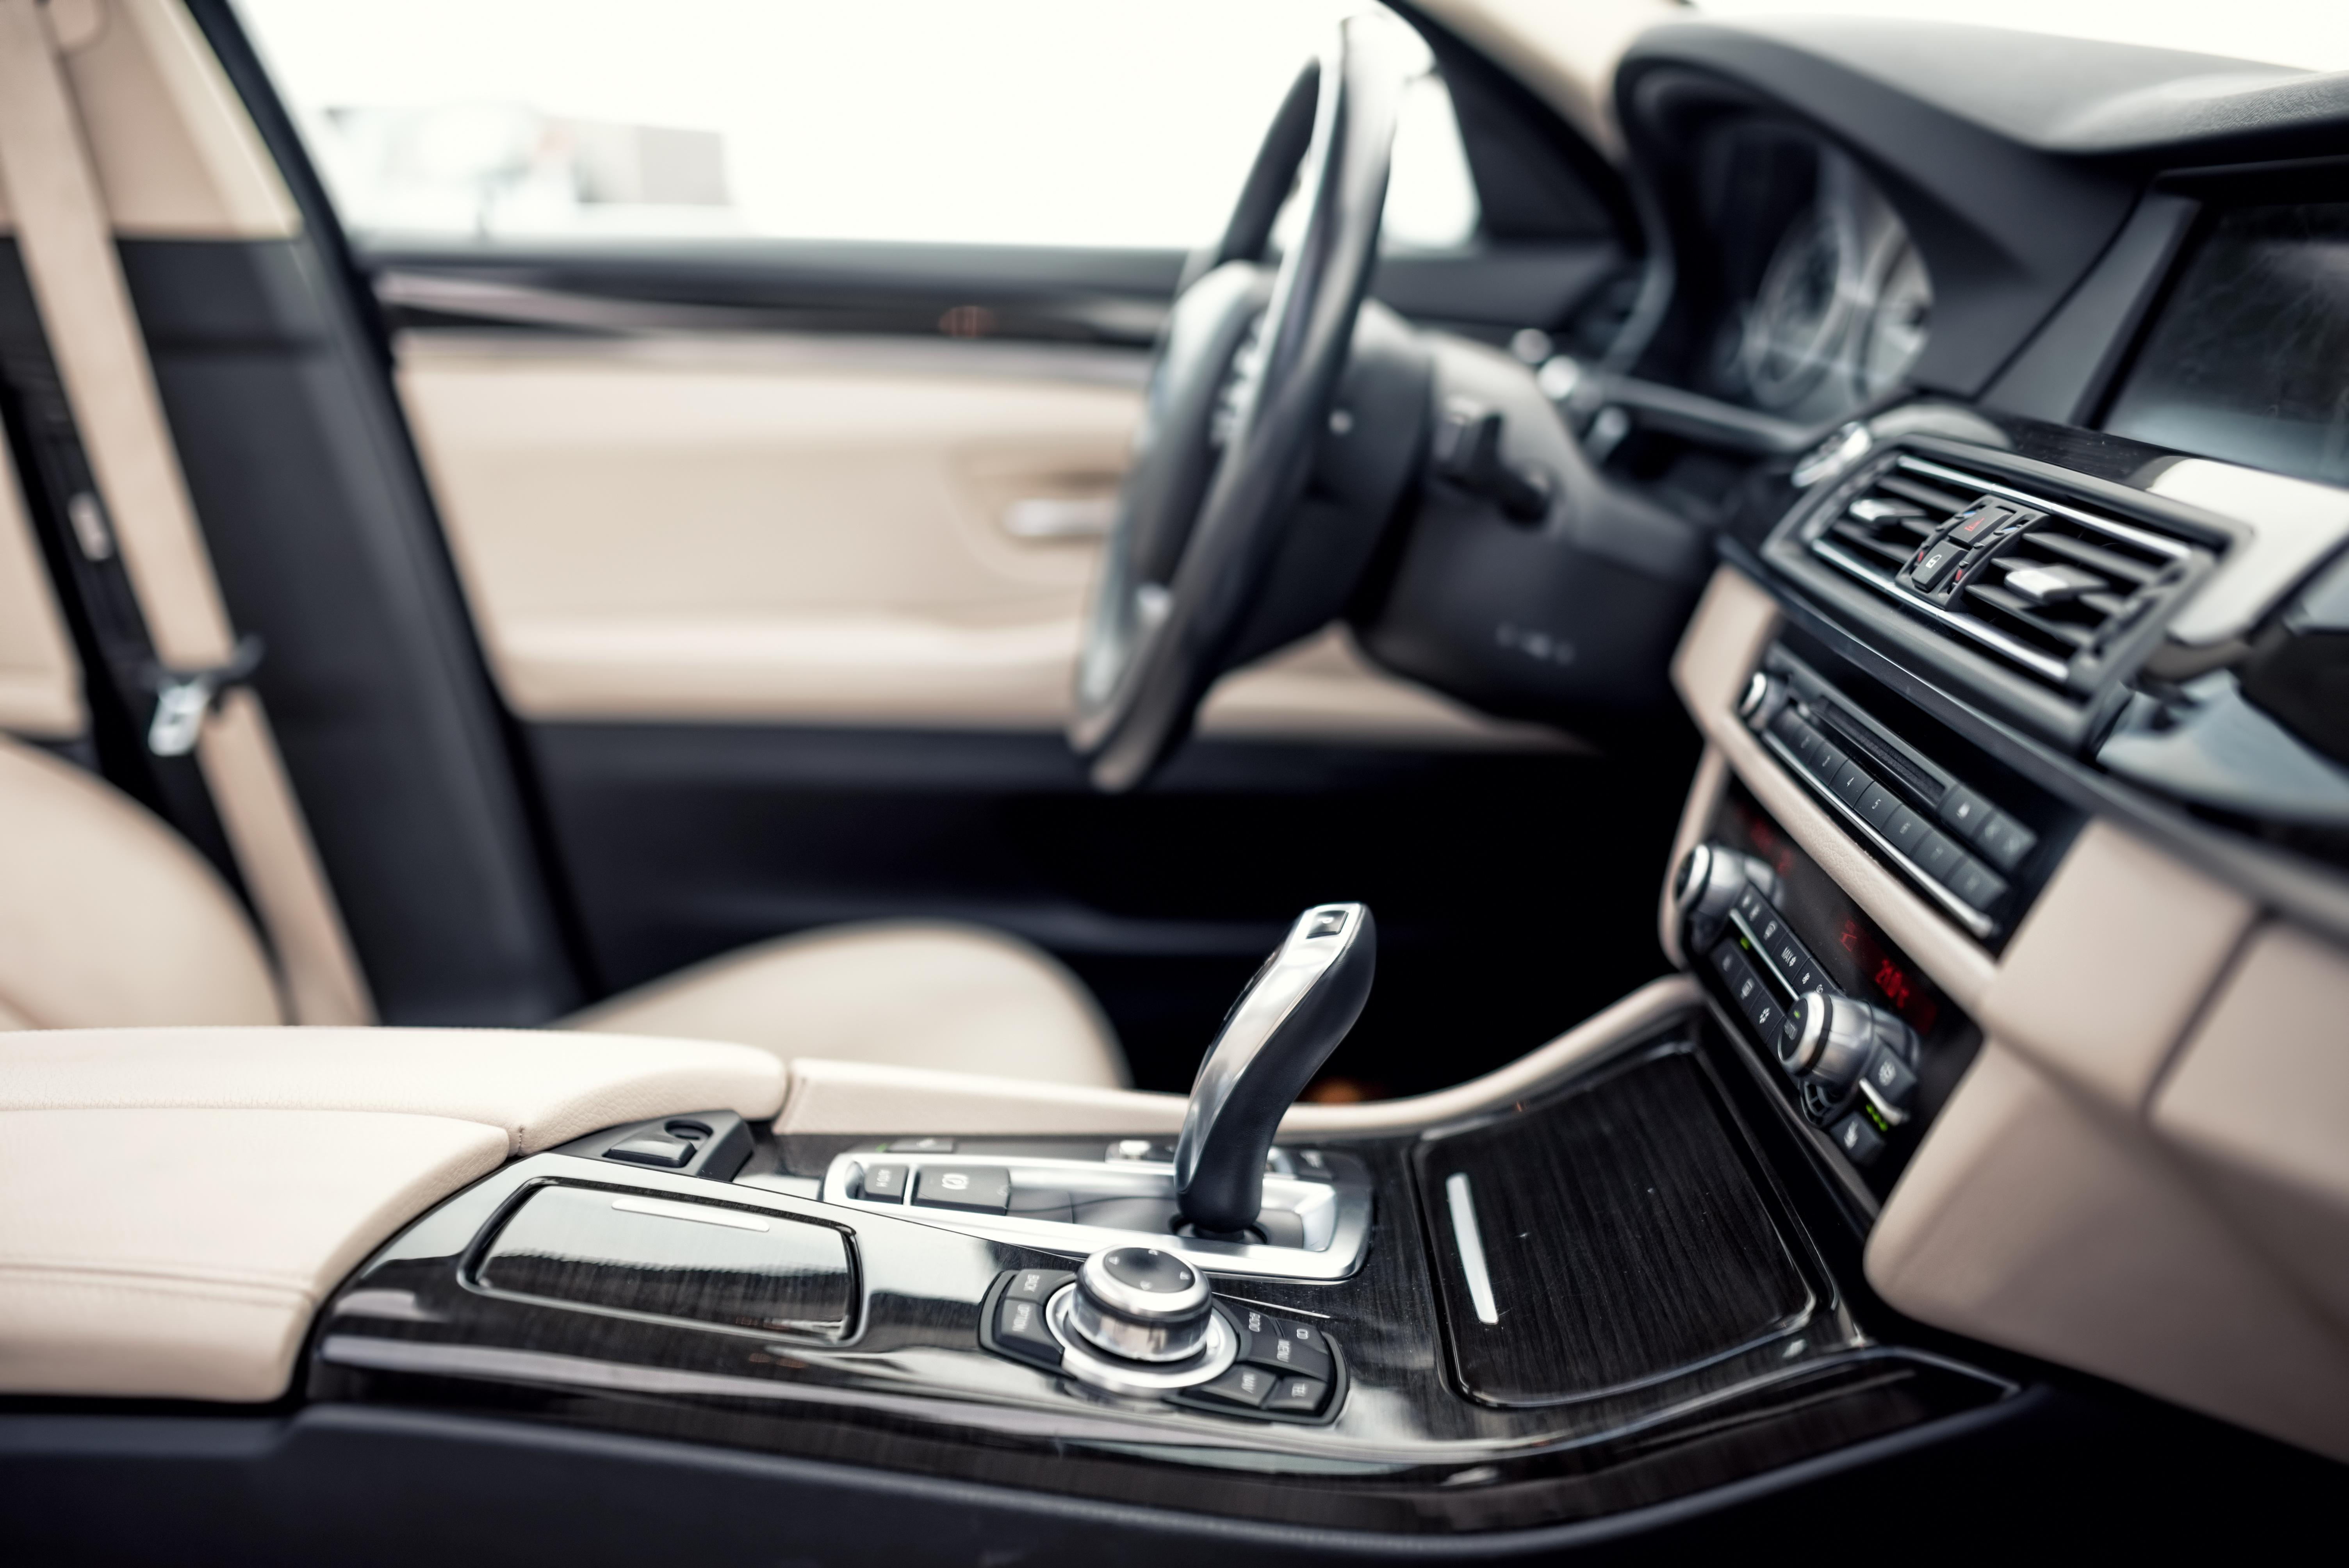 Detail Shops Car Upholstery Repair Federal Way Wa Call